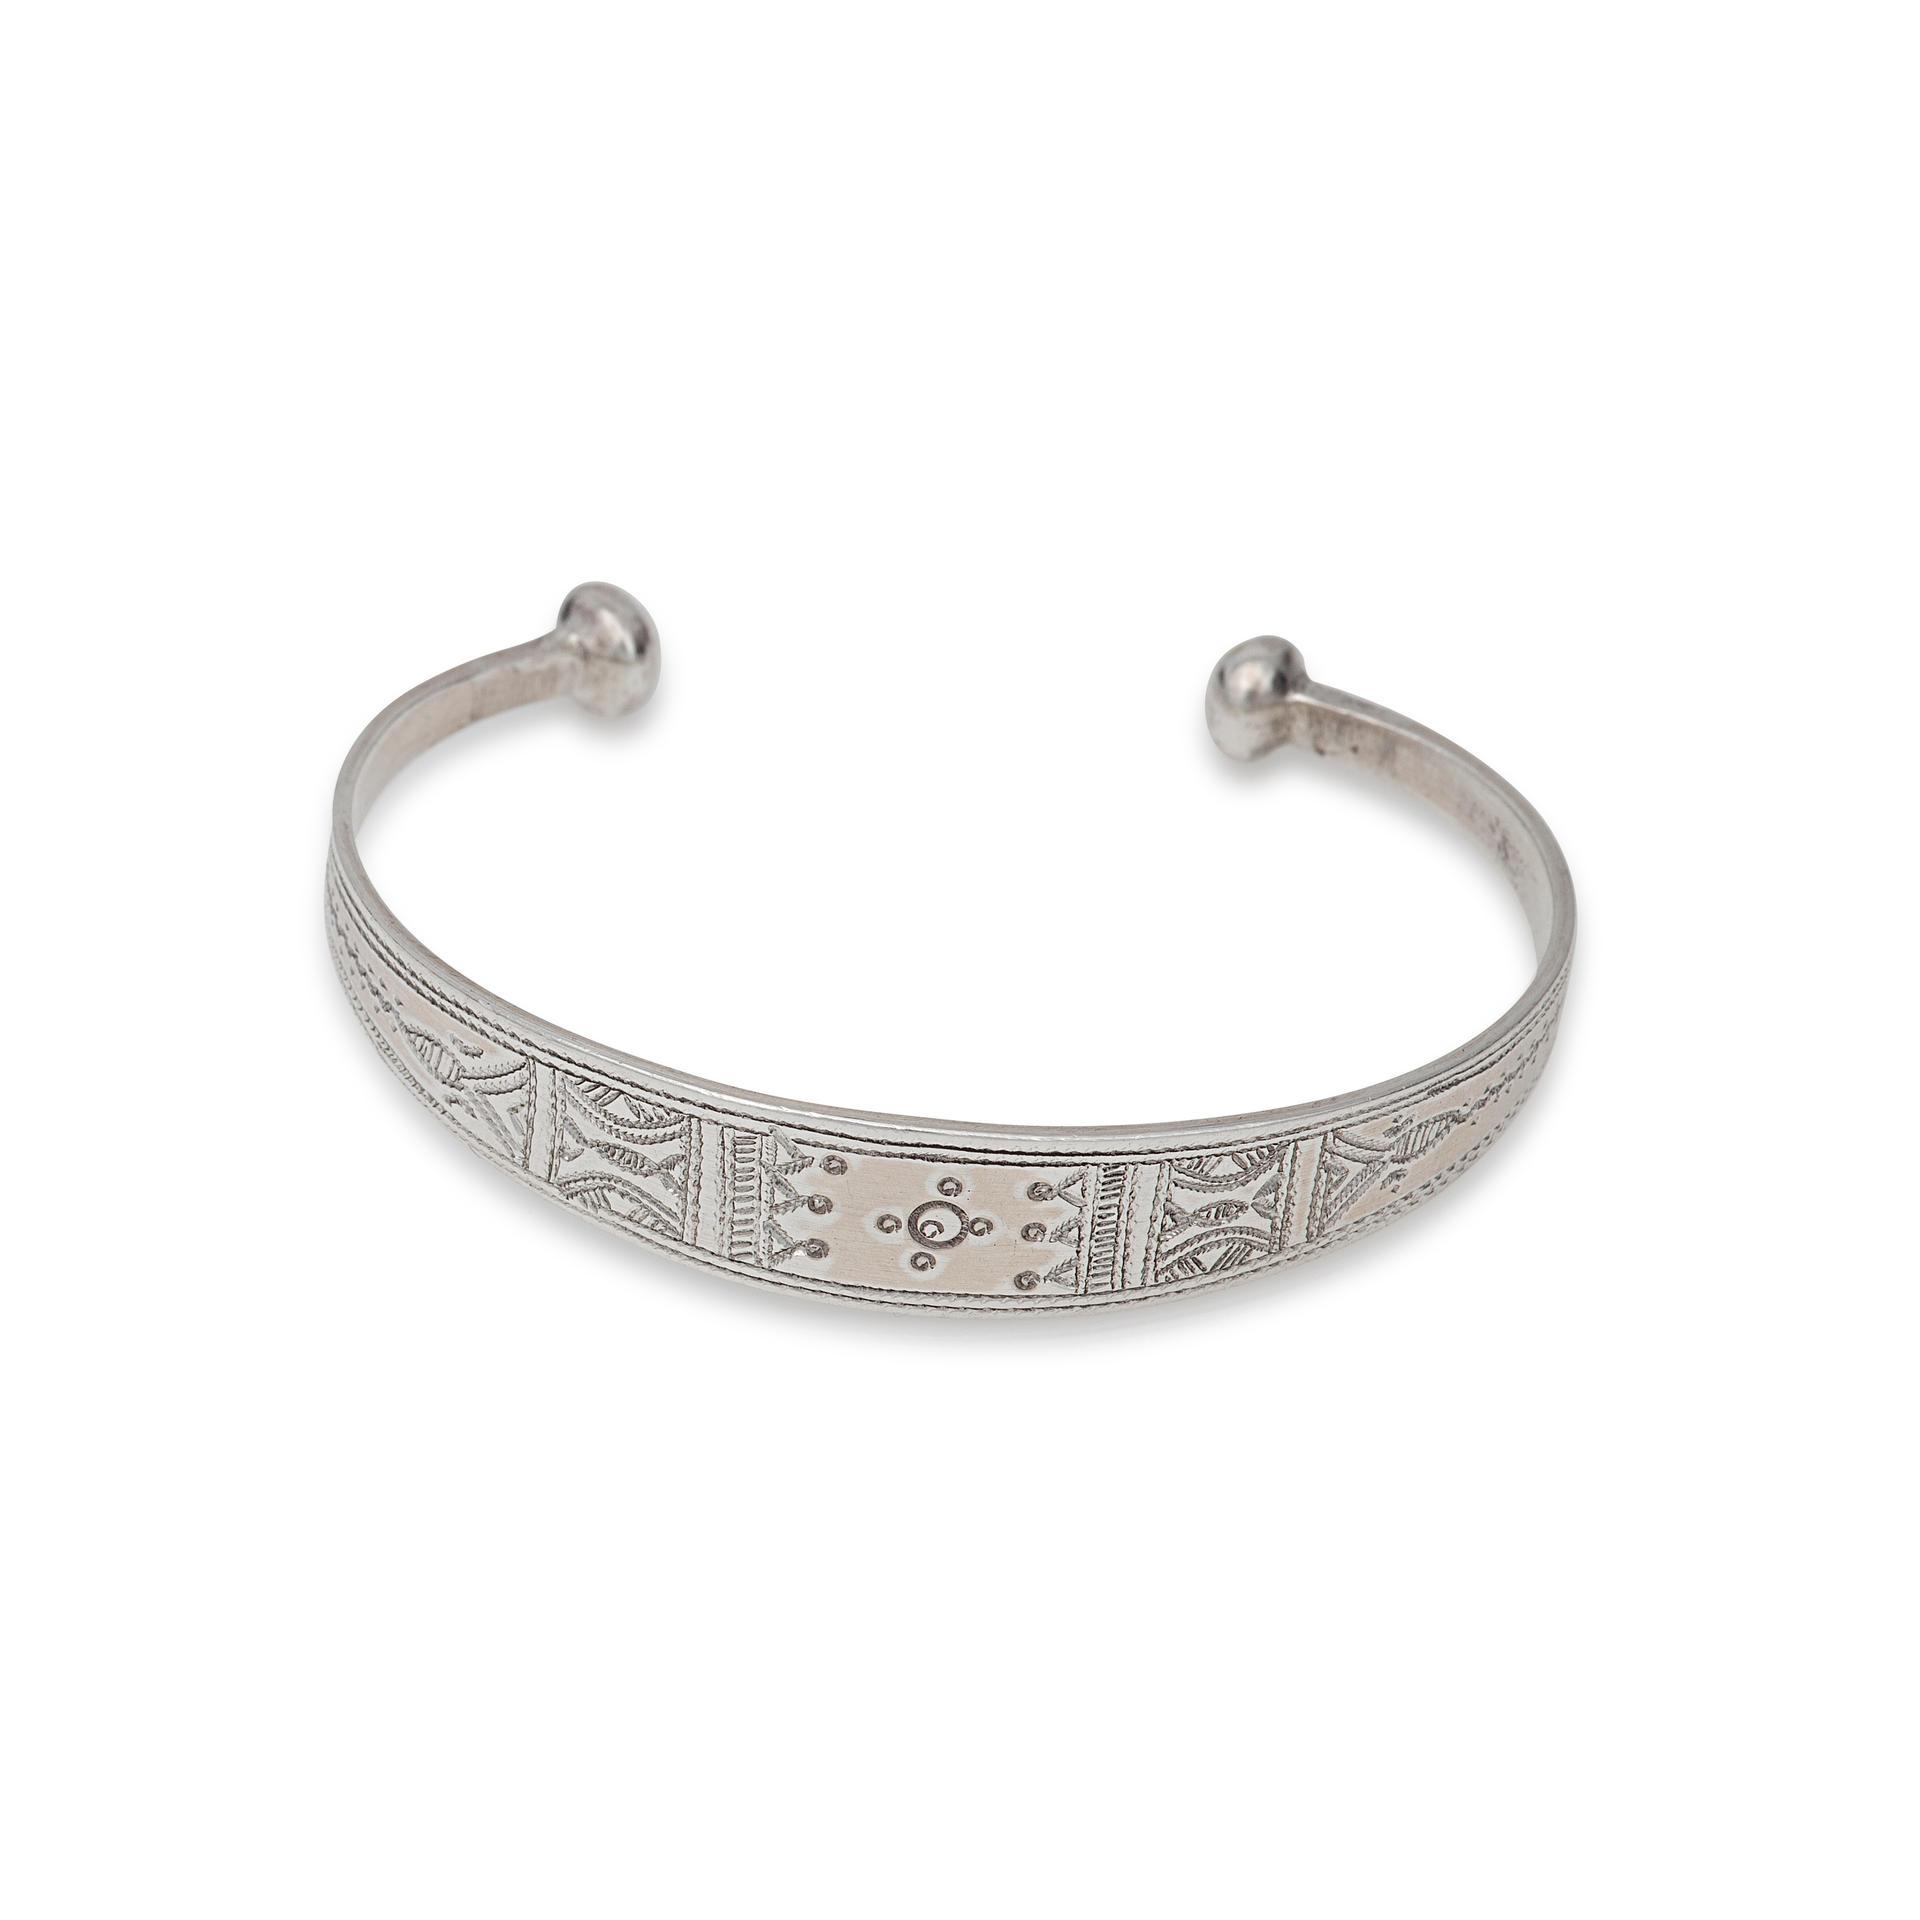 Bijoux Argent Noircis : Bracelet fin en argent atta gundara